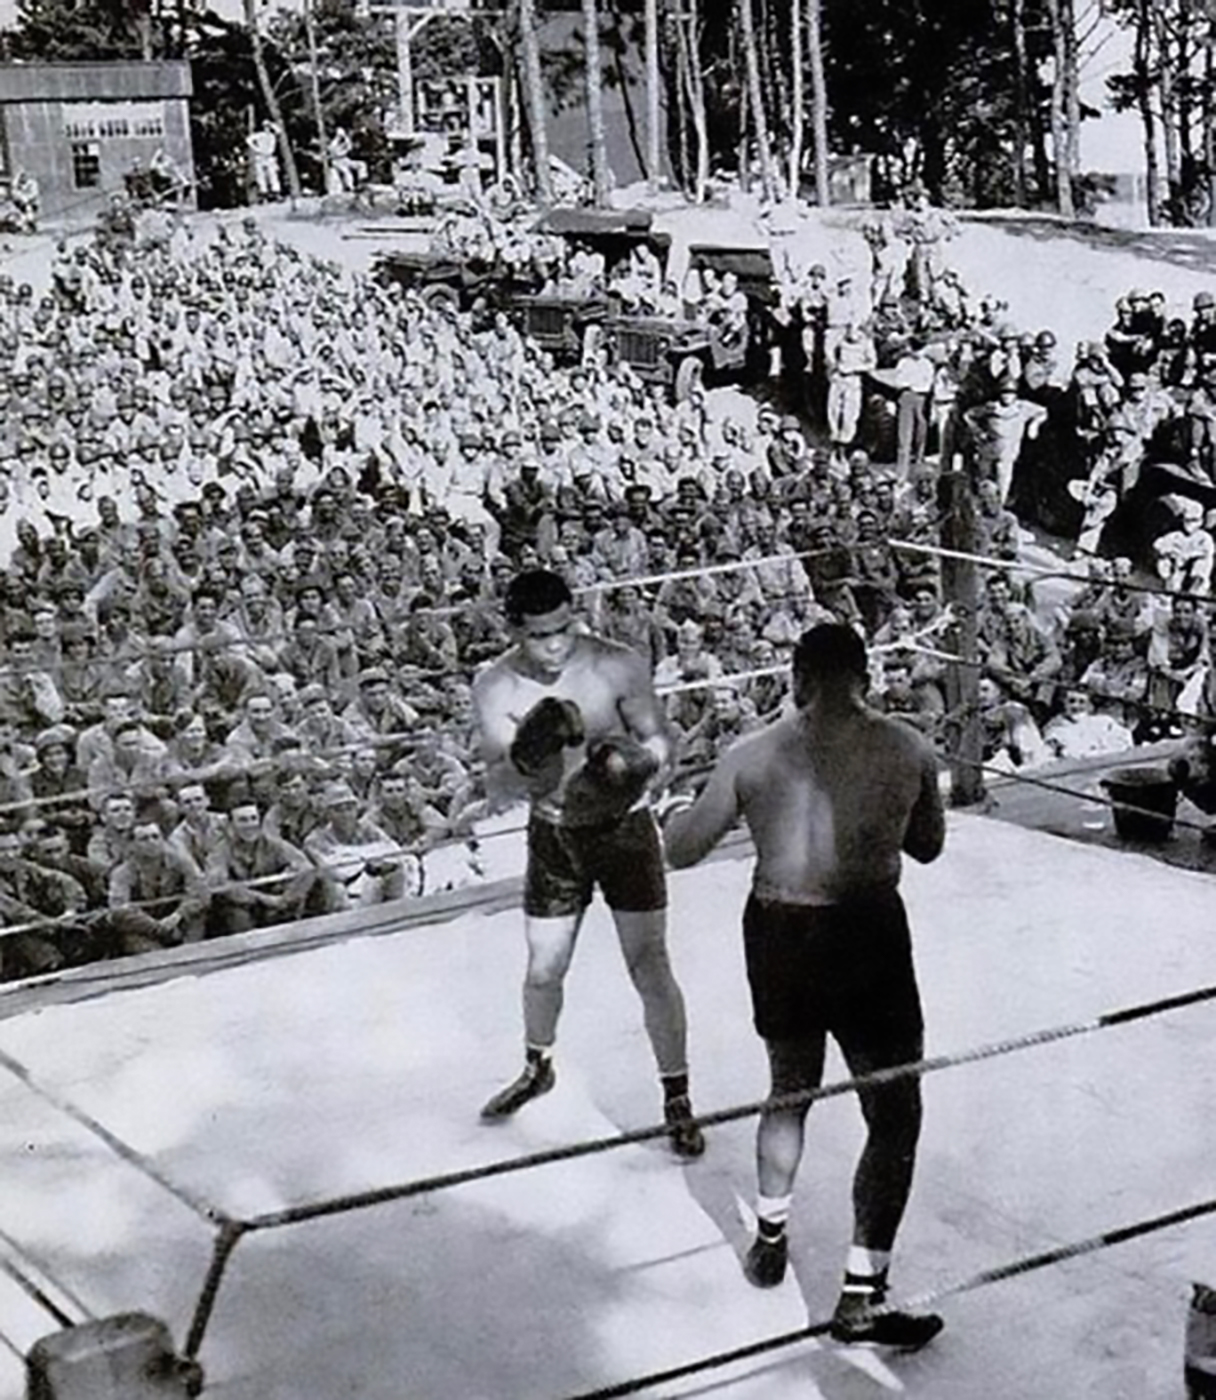 Joe Louis Bourbon - Joe Louis, world heavyweight champion, during exhibition fight for USA troops